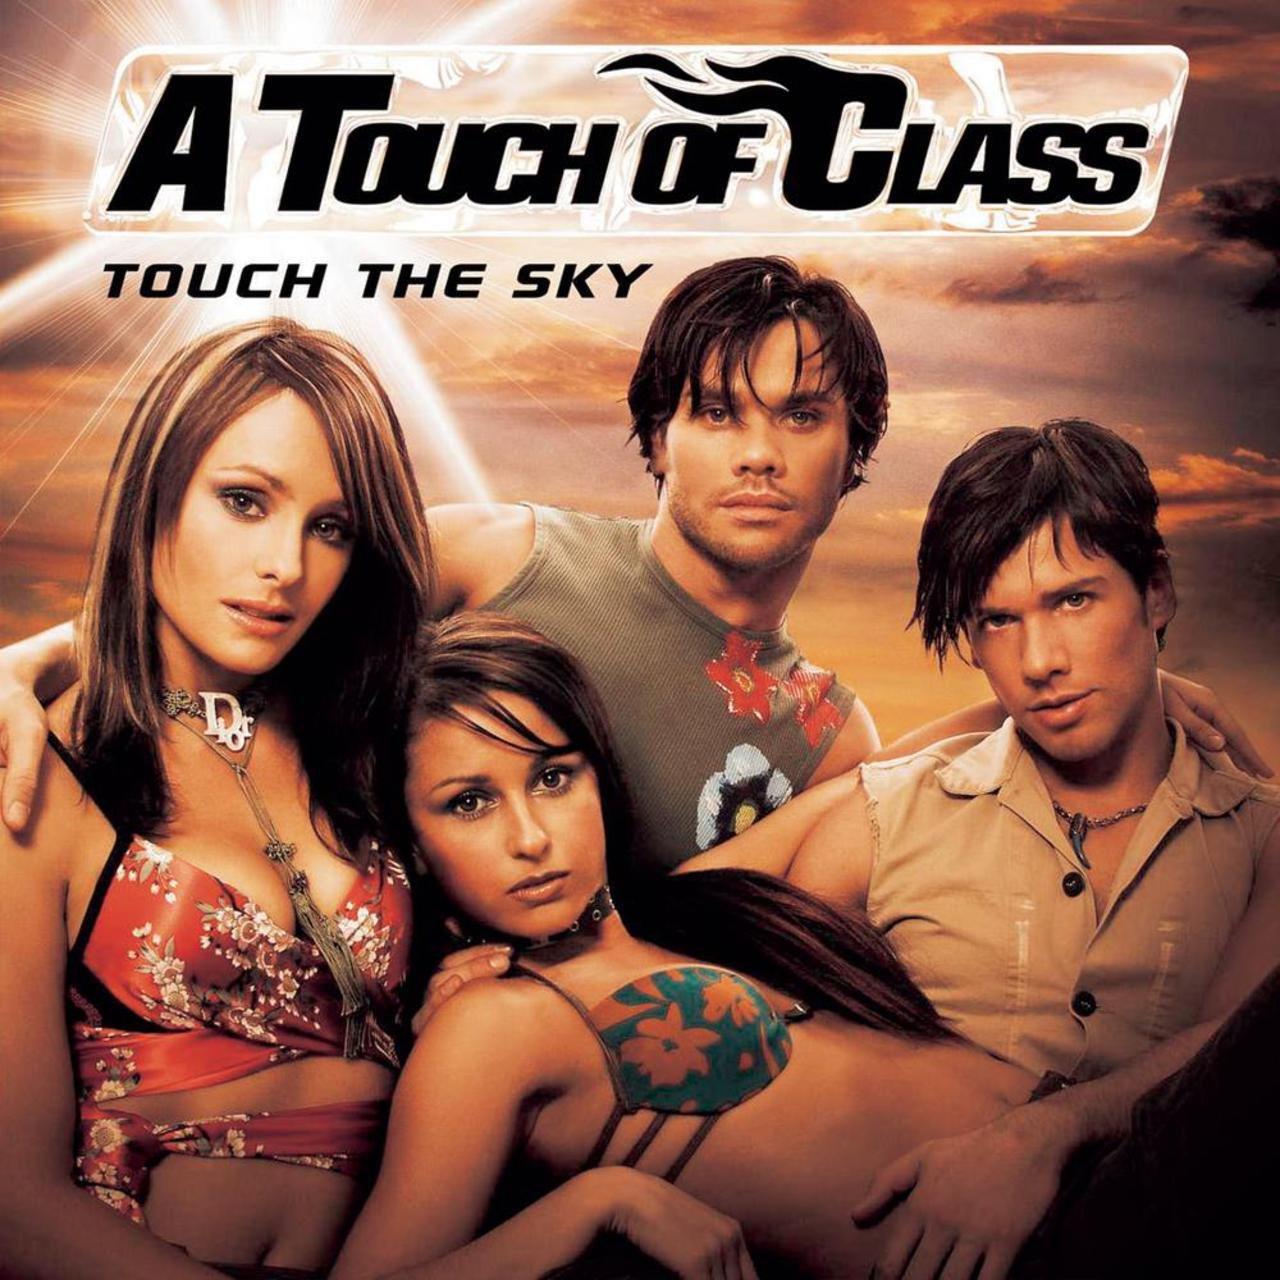 Atc album Touch The Sky